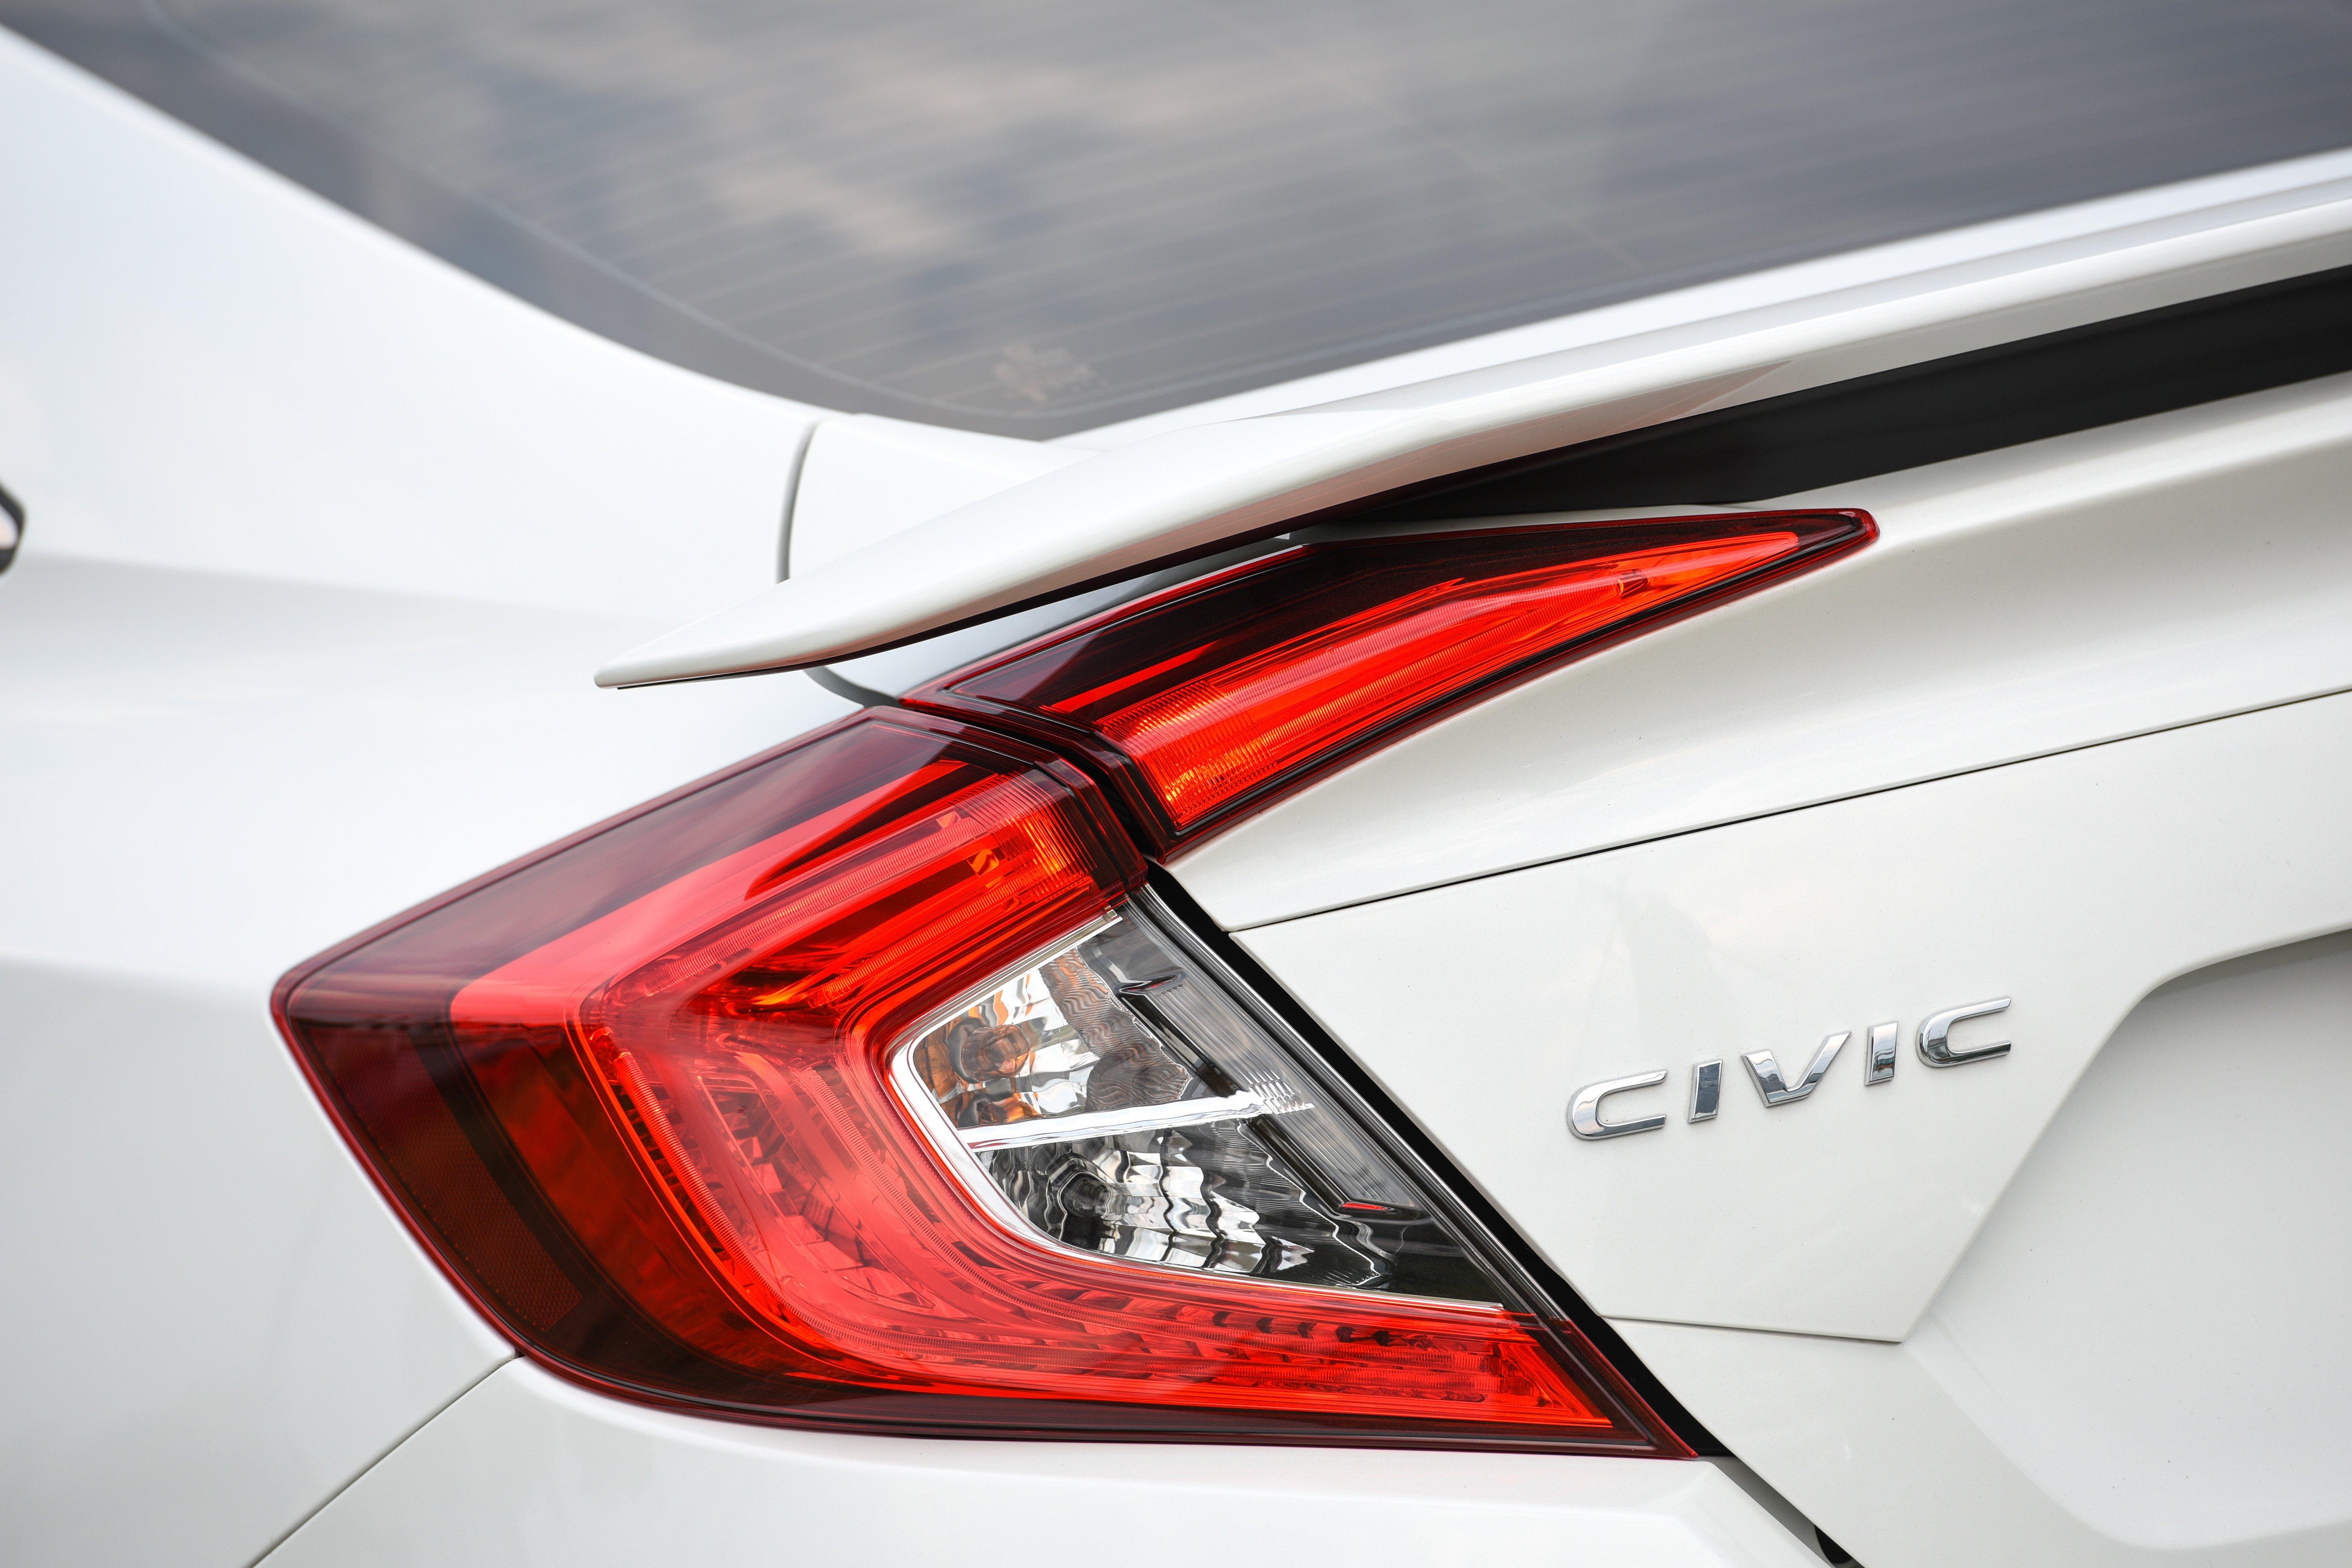 10th Generation Civic Exclusive Pakistan Launch - 2016 Honda Civic Thailand 52